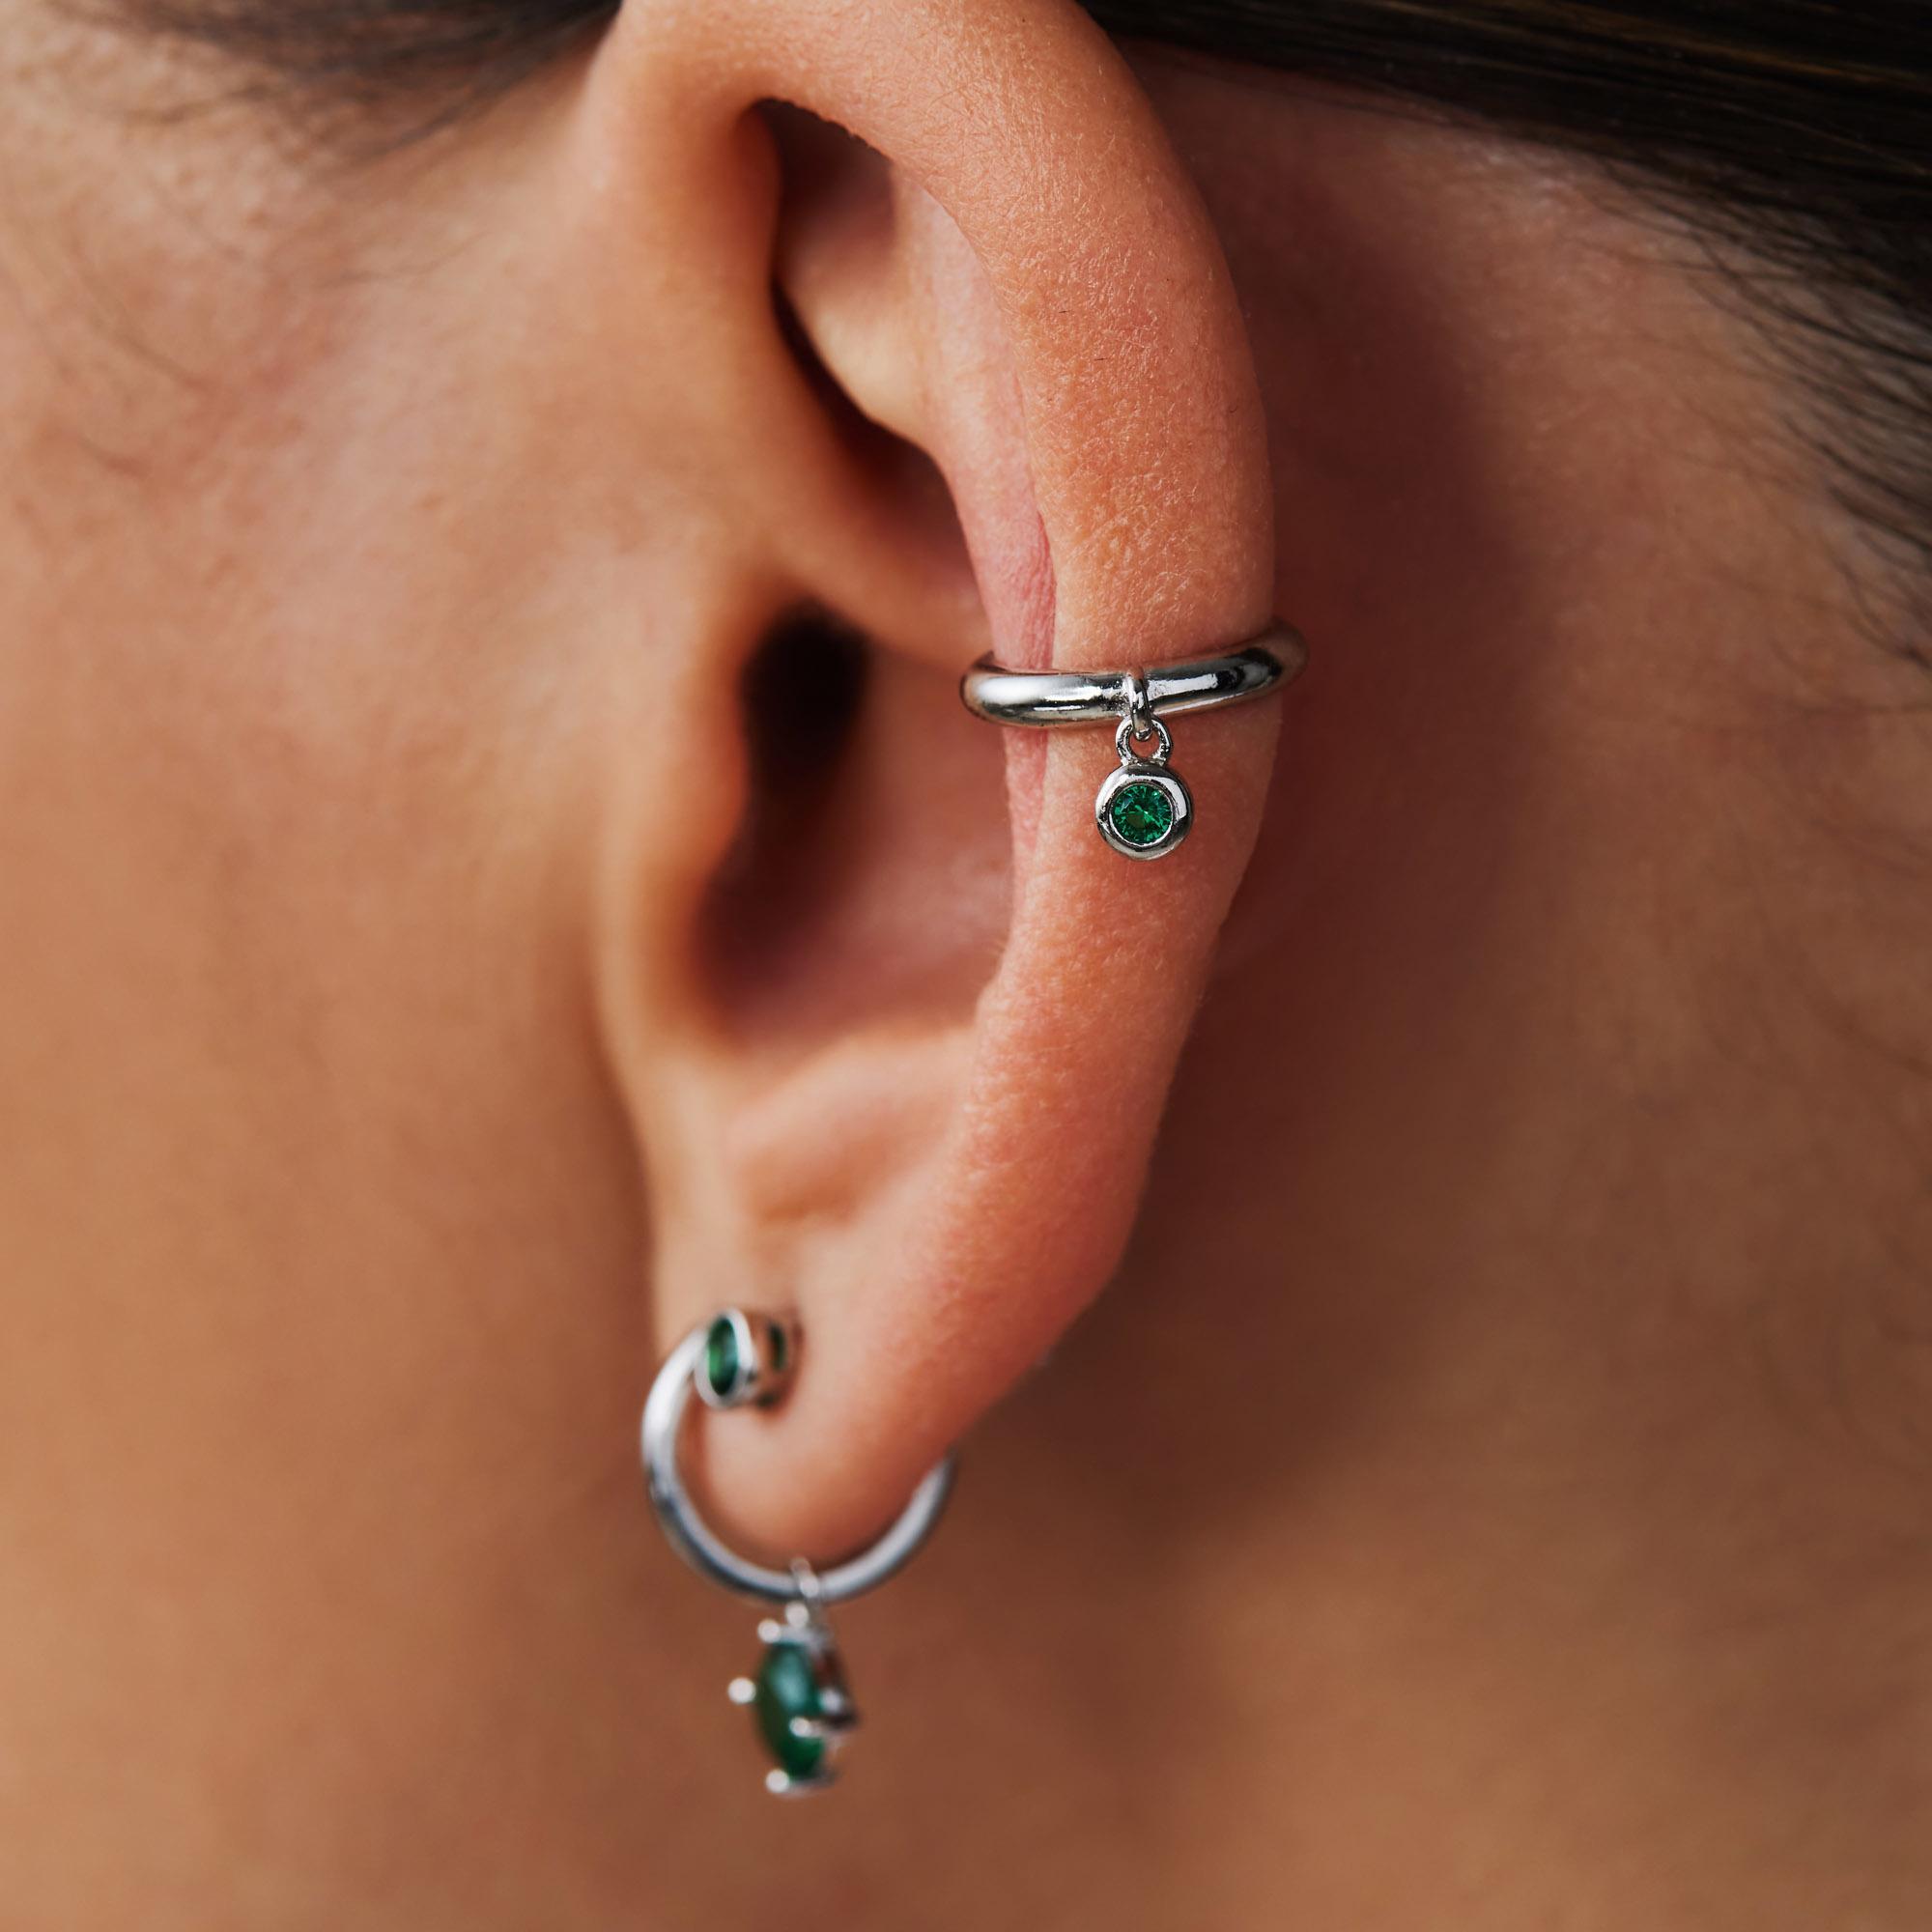 Violet Hamden Venus ear cuff in argento sterling 925 con birthstone